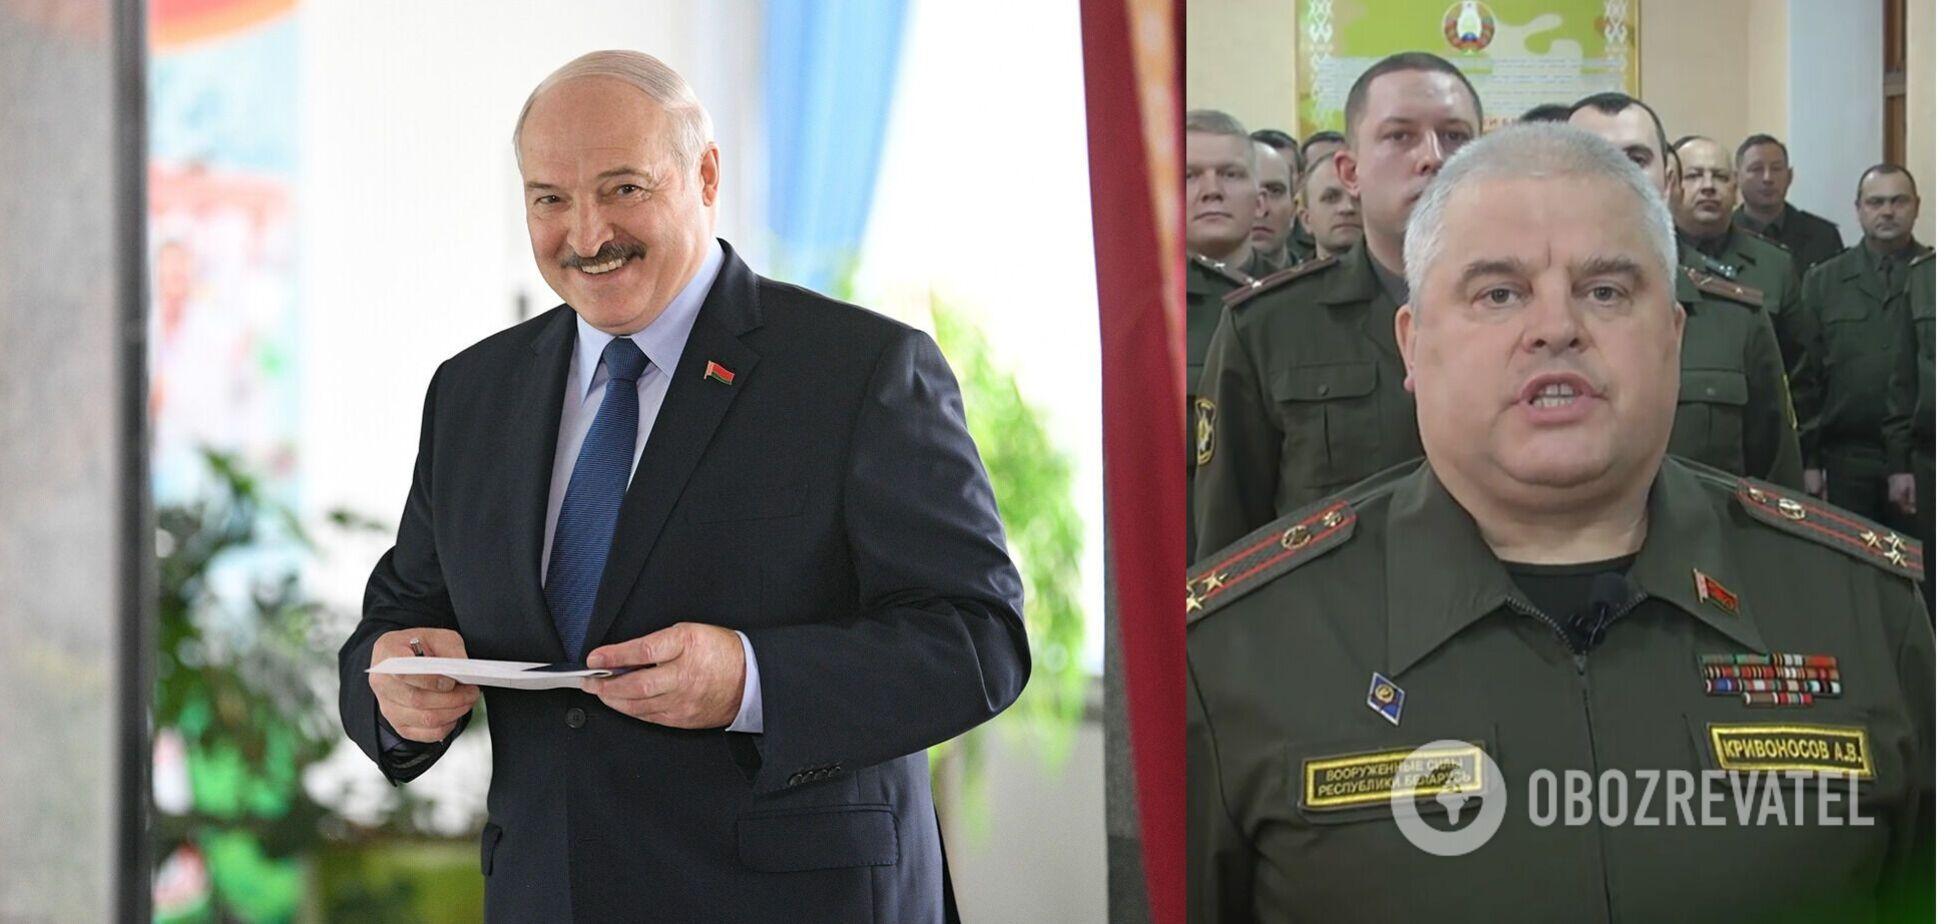 Александр Лукашенко и Андрей Кривоносов